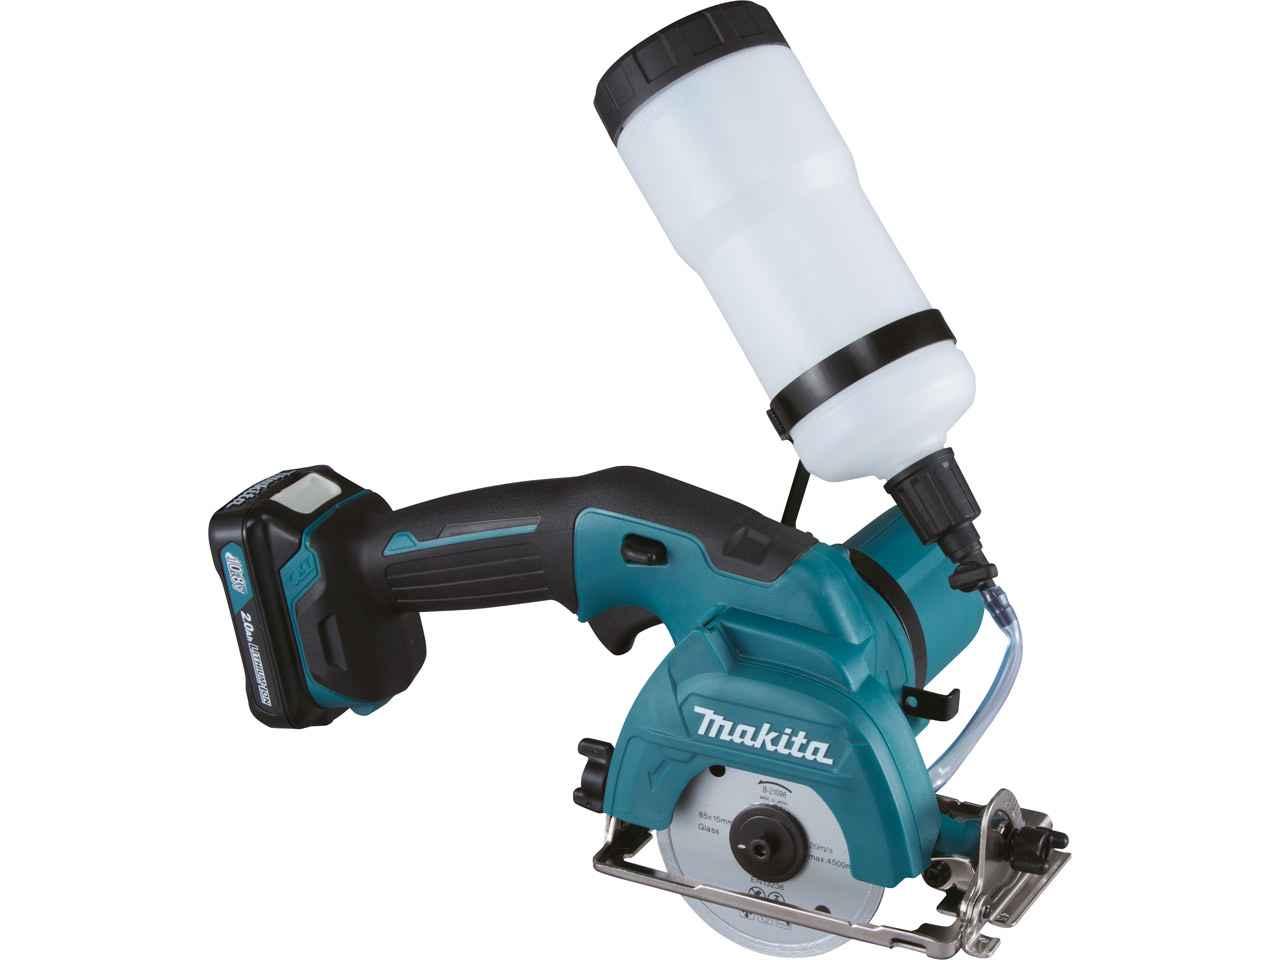 Makita Cc301dwae 10.8v Cxt 2x2.0ah 85mm Tile Cutter Kit